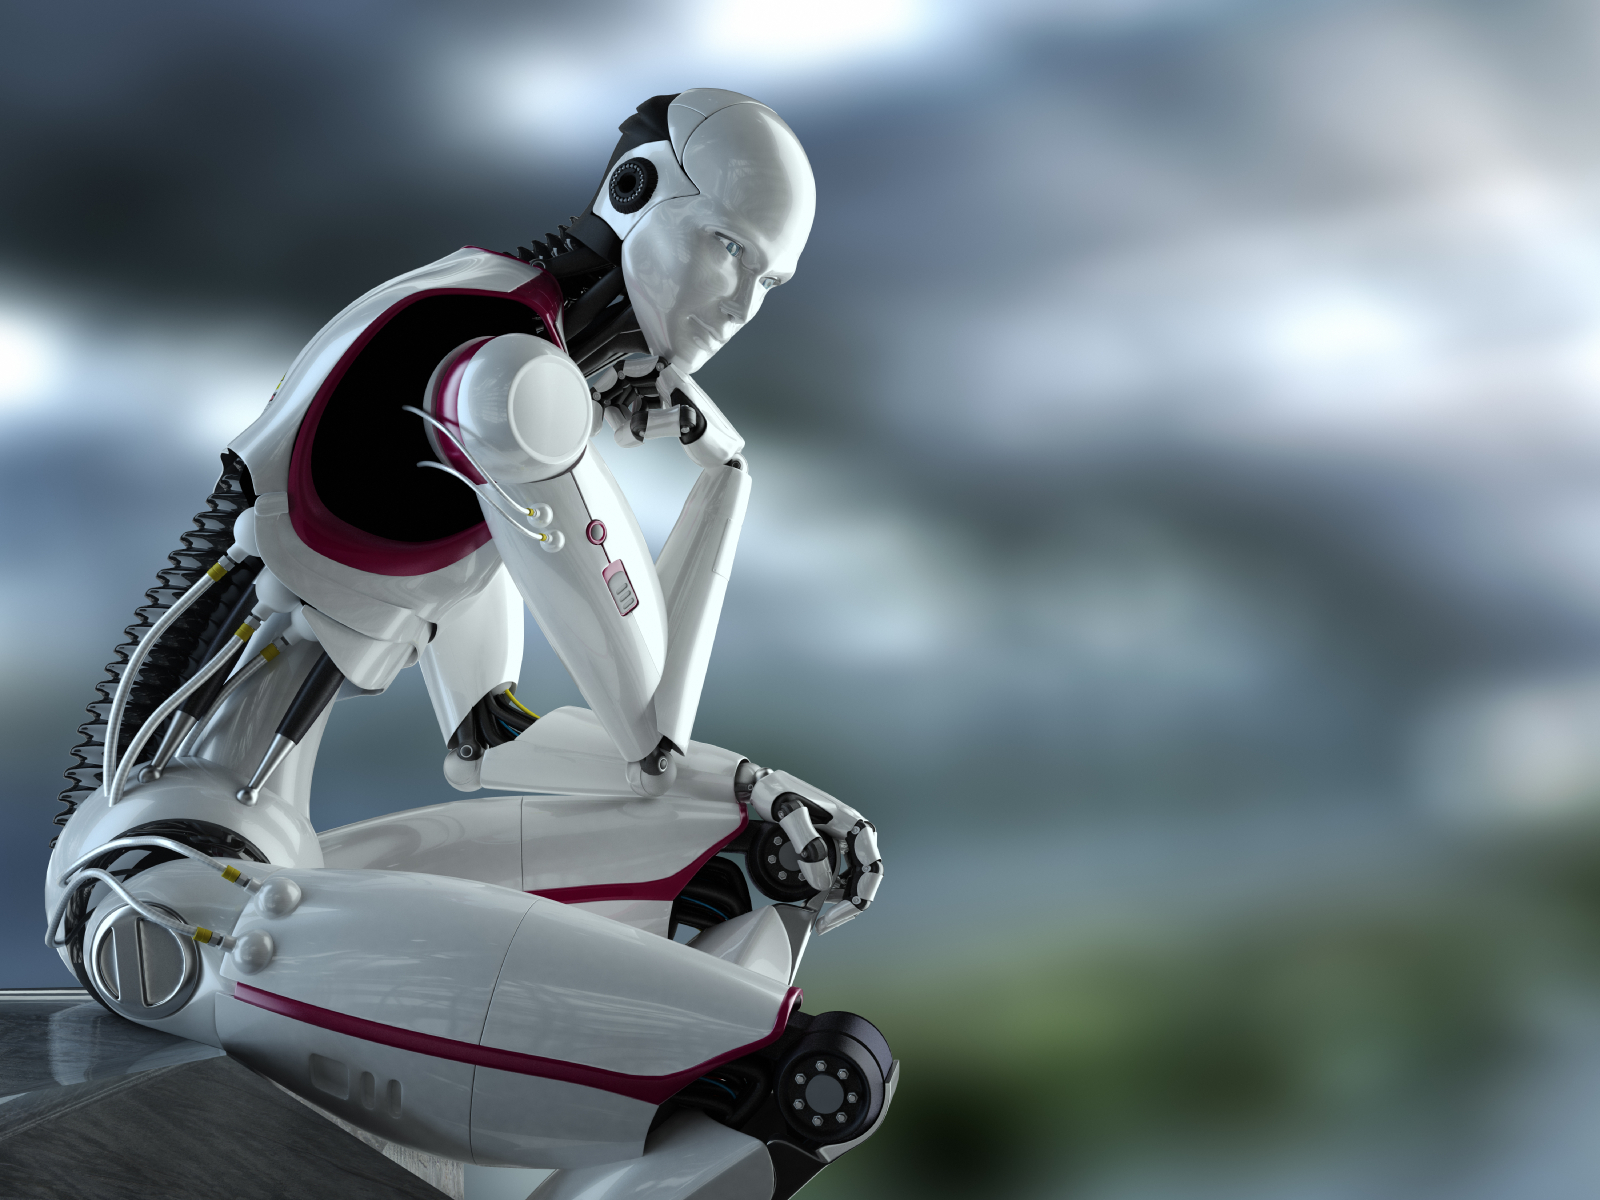 https://secureservercdn.net/198.71.233.138/0va.650.myftpupload.com/wp-content/uploads/2016/02/robot-artificial-intelligence.jpg